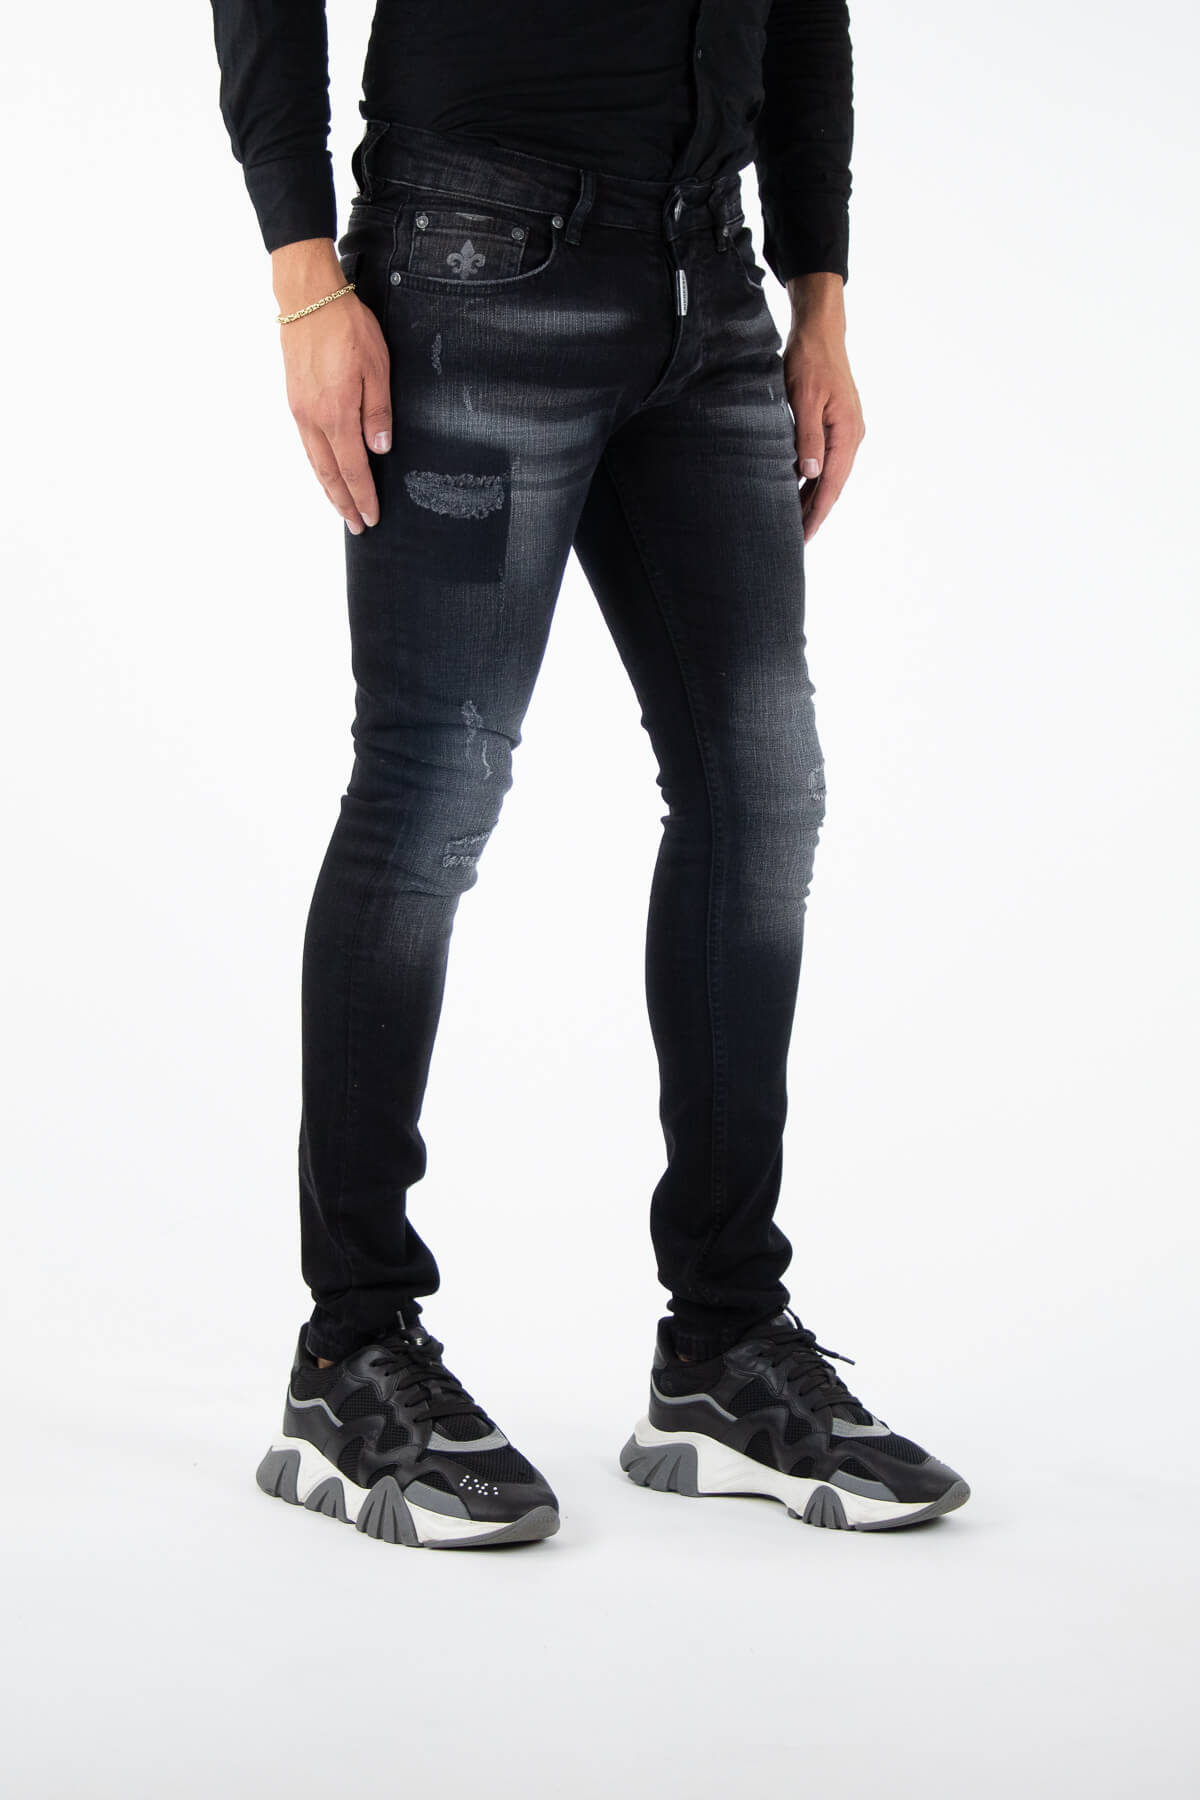 Novara Black Jeans-2